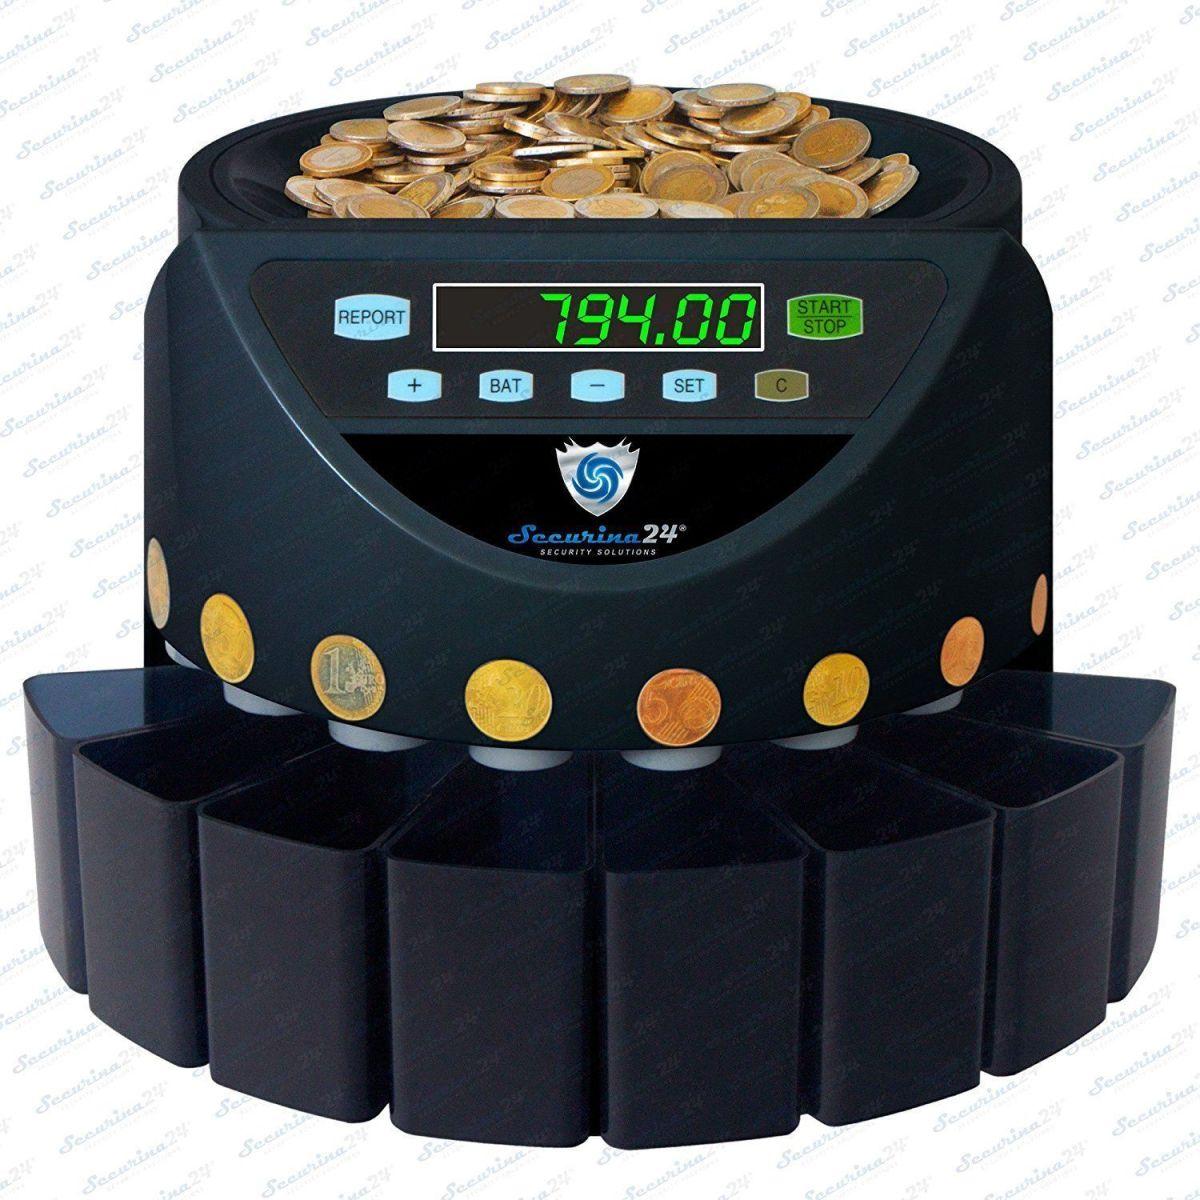 Análisis al completo del contador de monedas Securina24® SR1200BBB